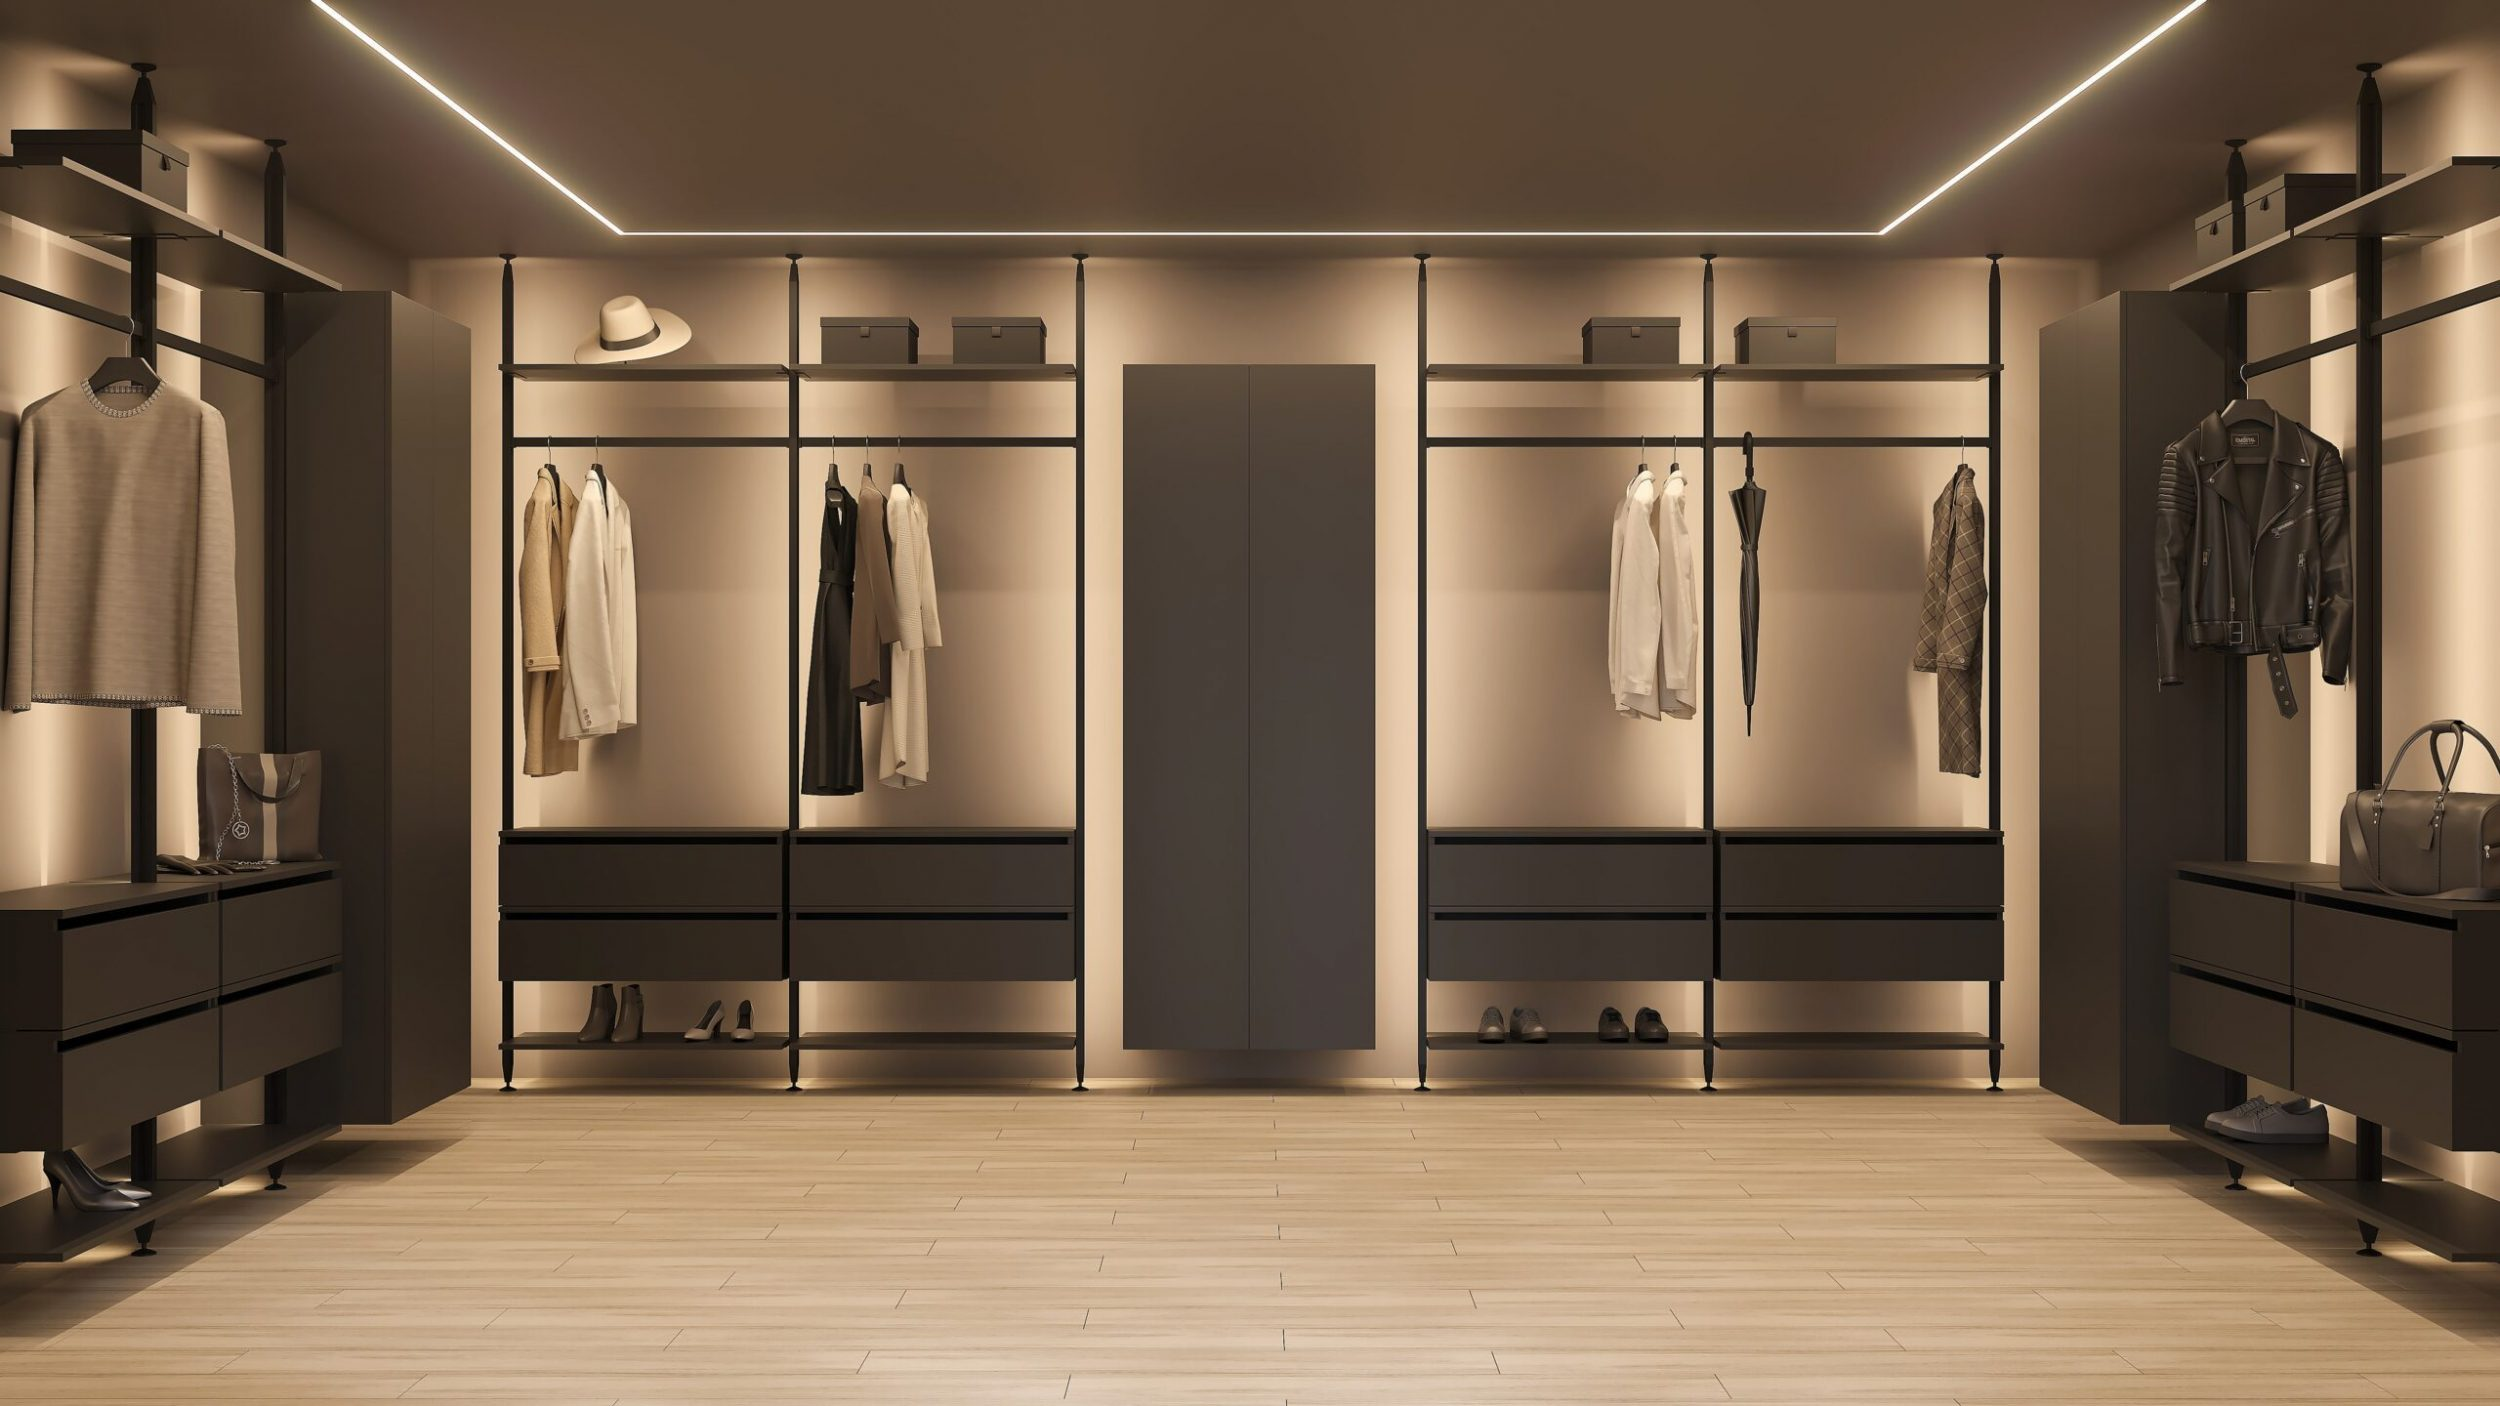 kitchen_studio_wardrobe_black_tie11-scaled